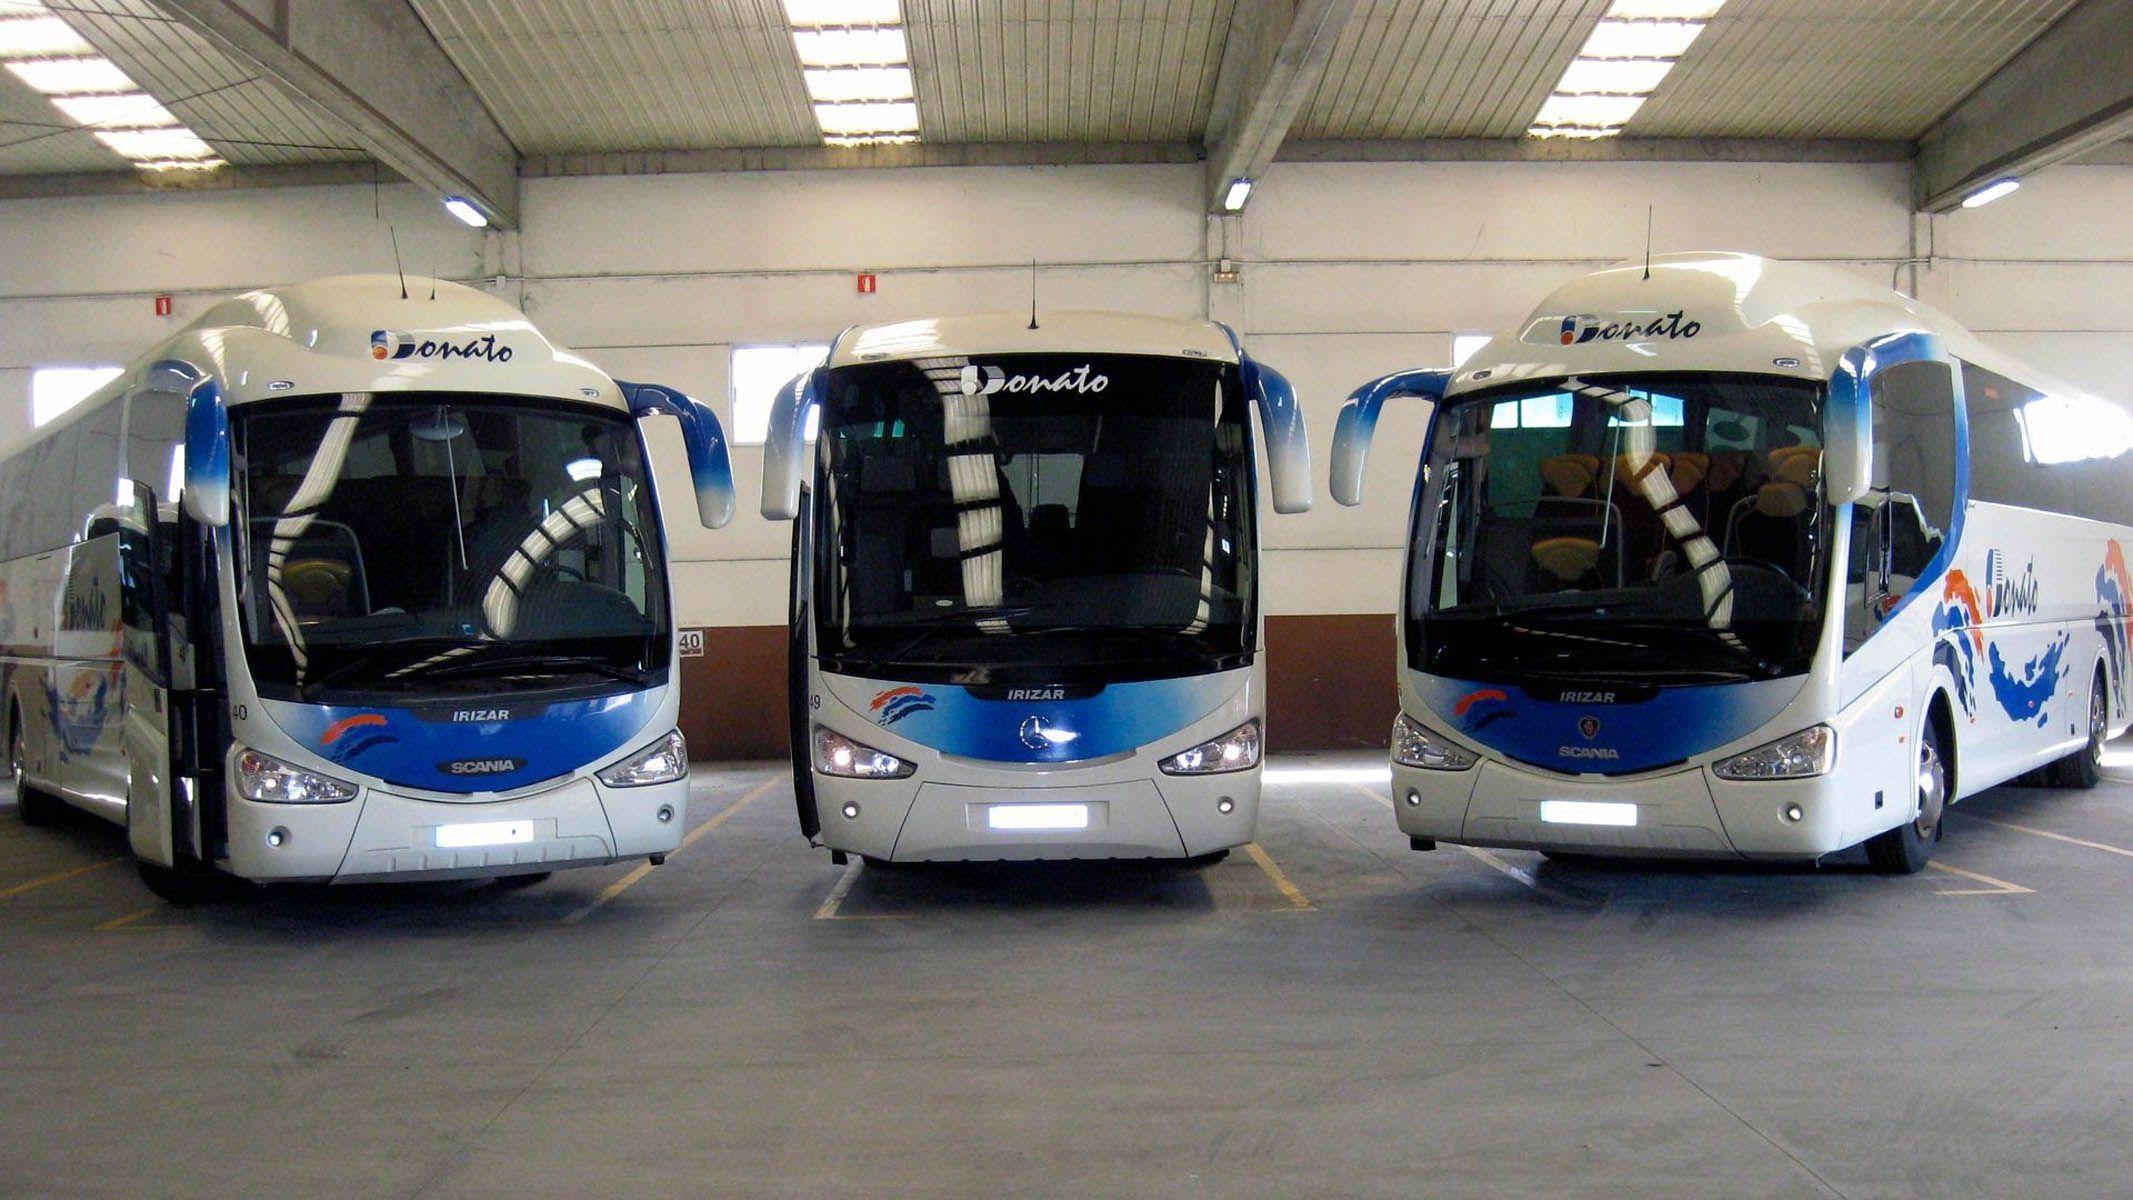 Foto 23 de Autocares en  | Taxis Donato